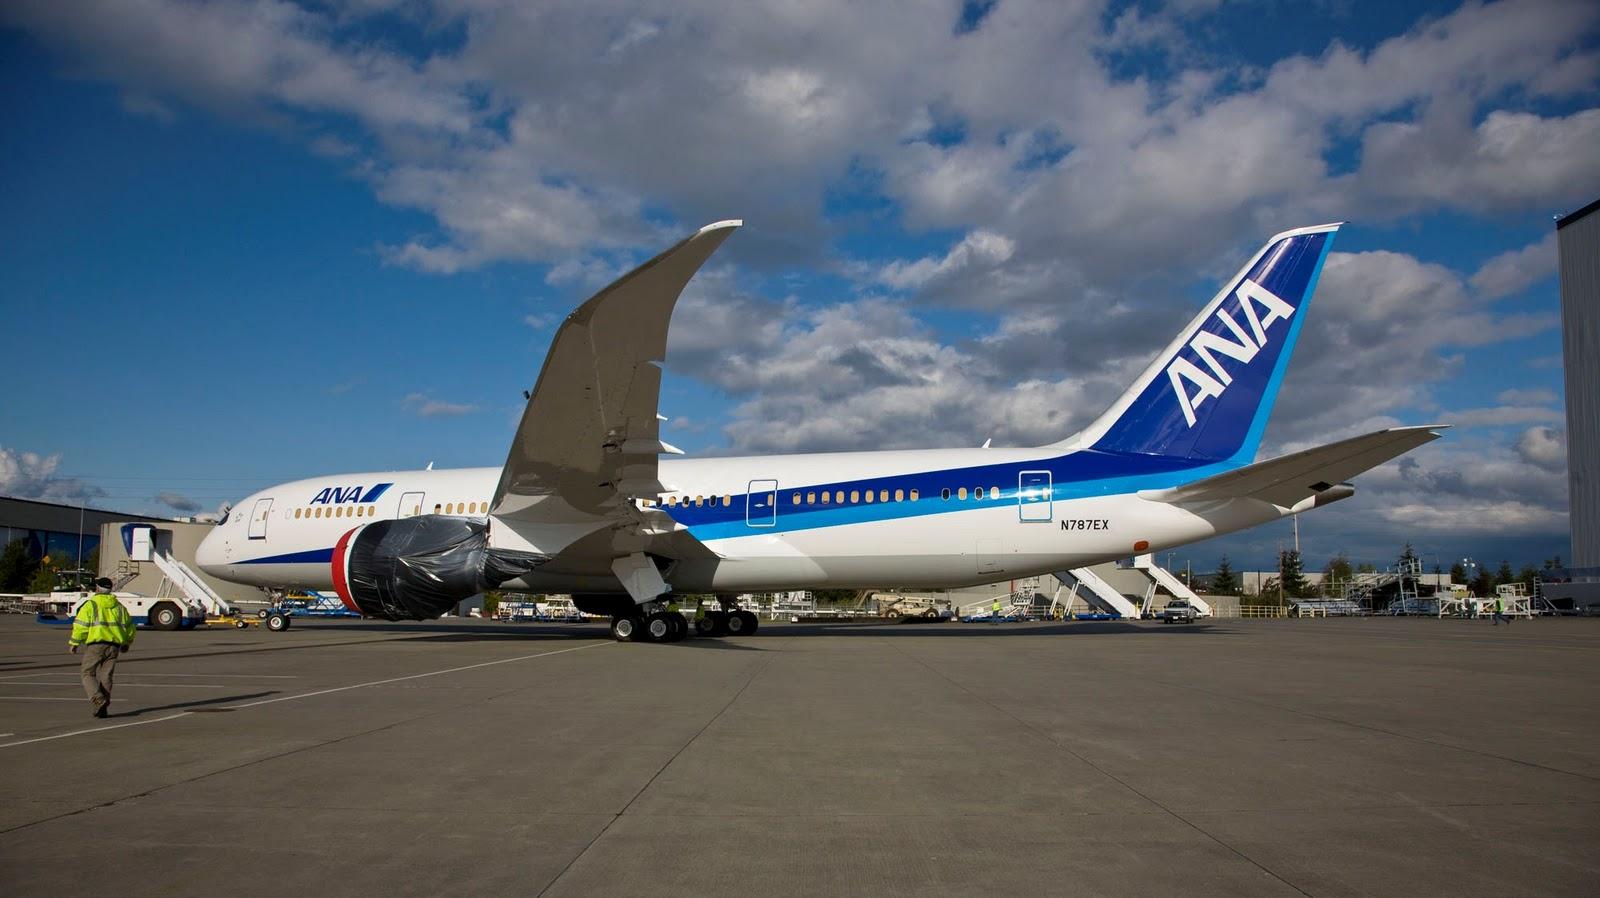 Ana Boeing 787 Dreamliner Wallpaper 868 Aeronefnet